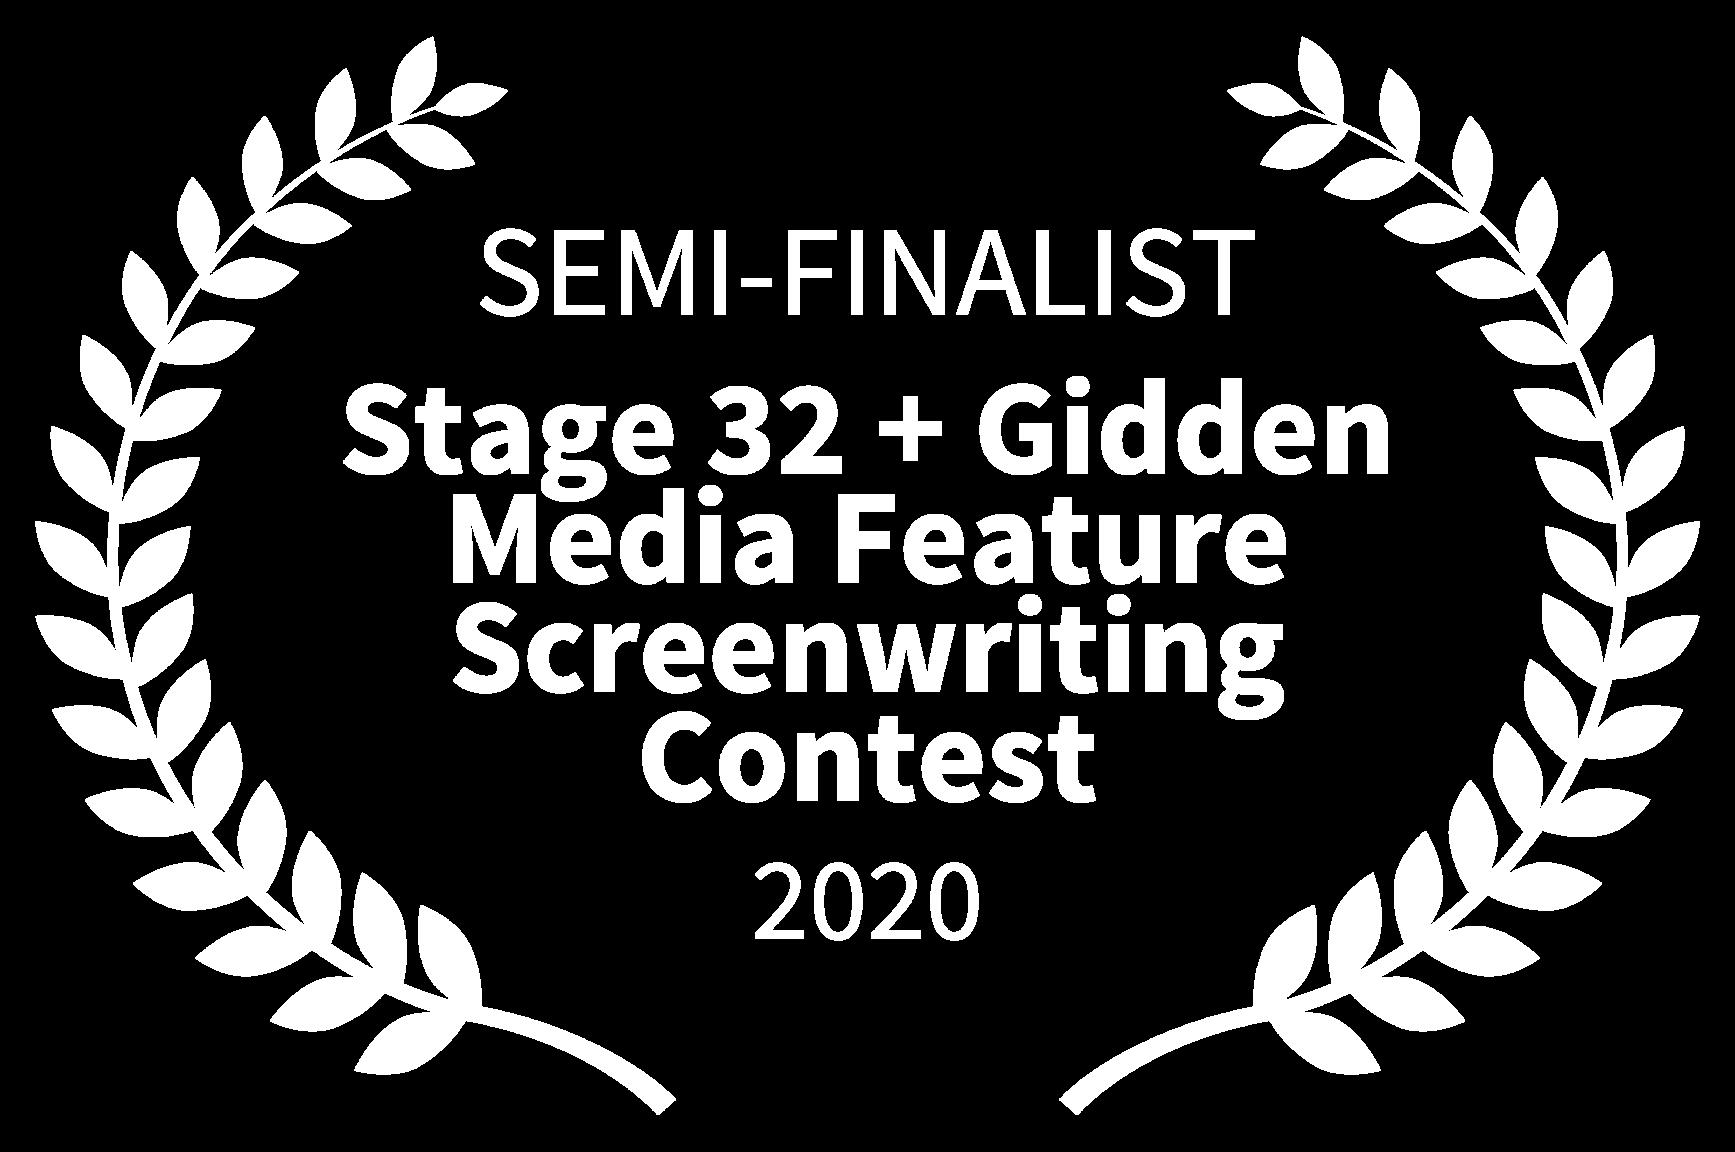 SEMI-FINALIST - Stage 32 Gidden Media Feature Screenwriting Contest - 2020